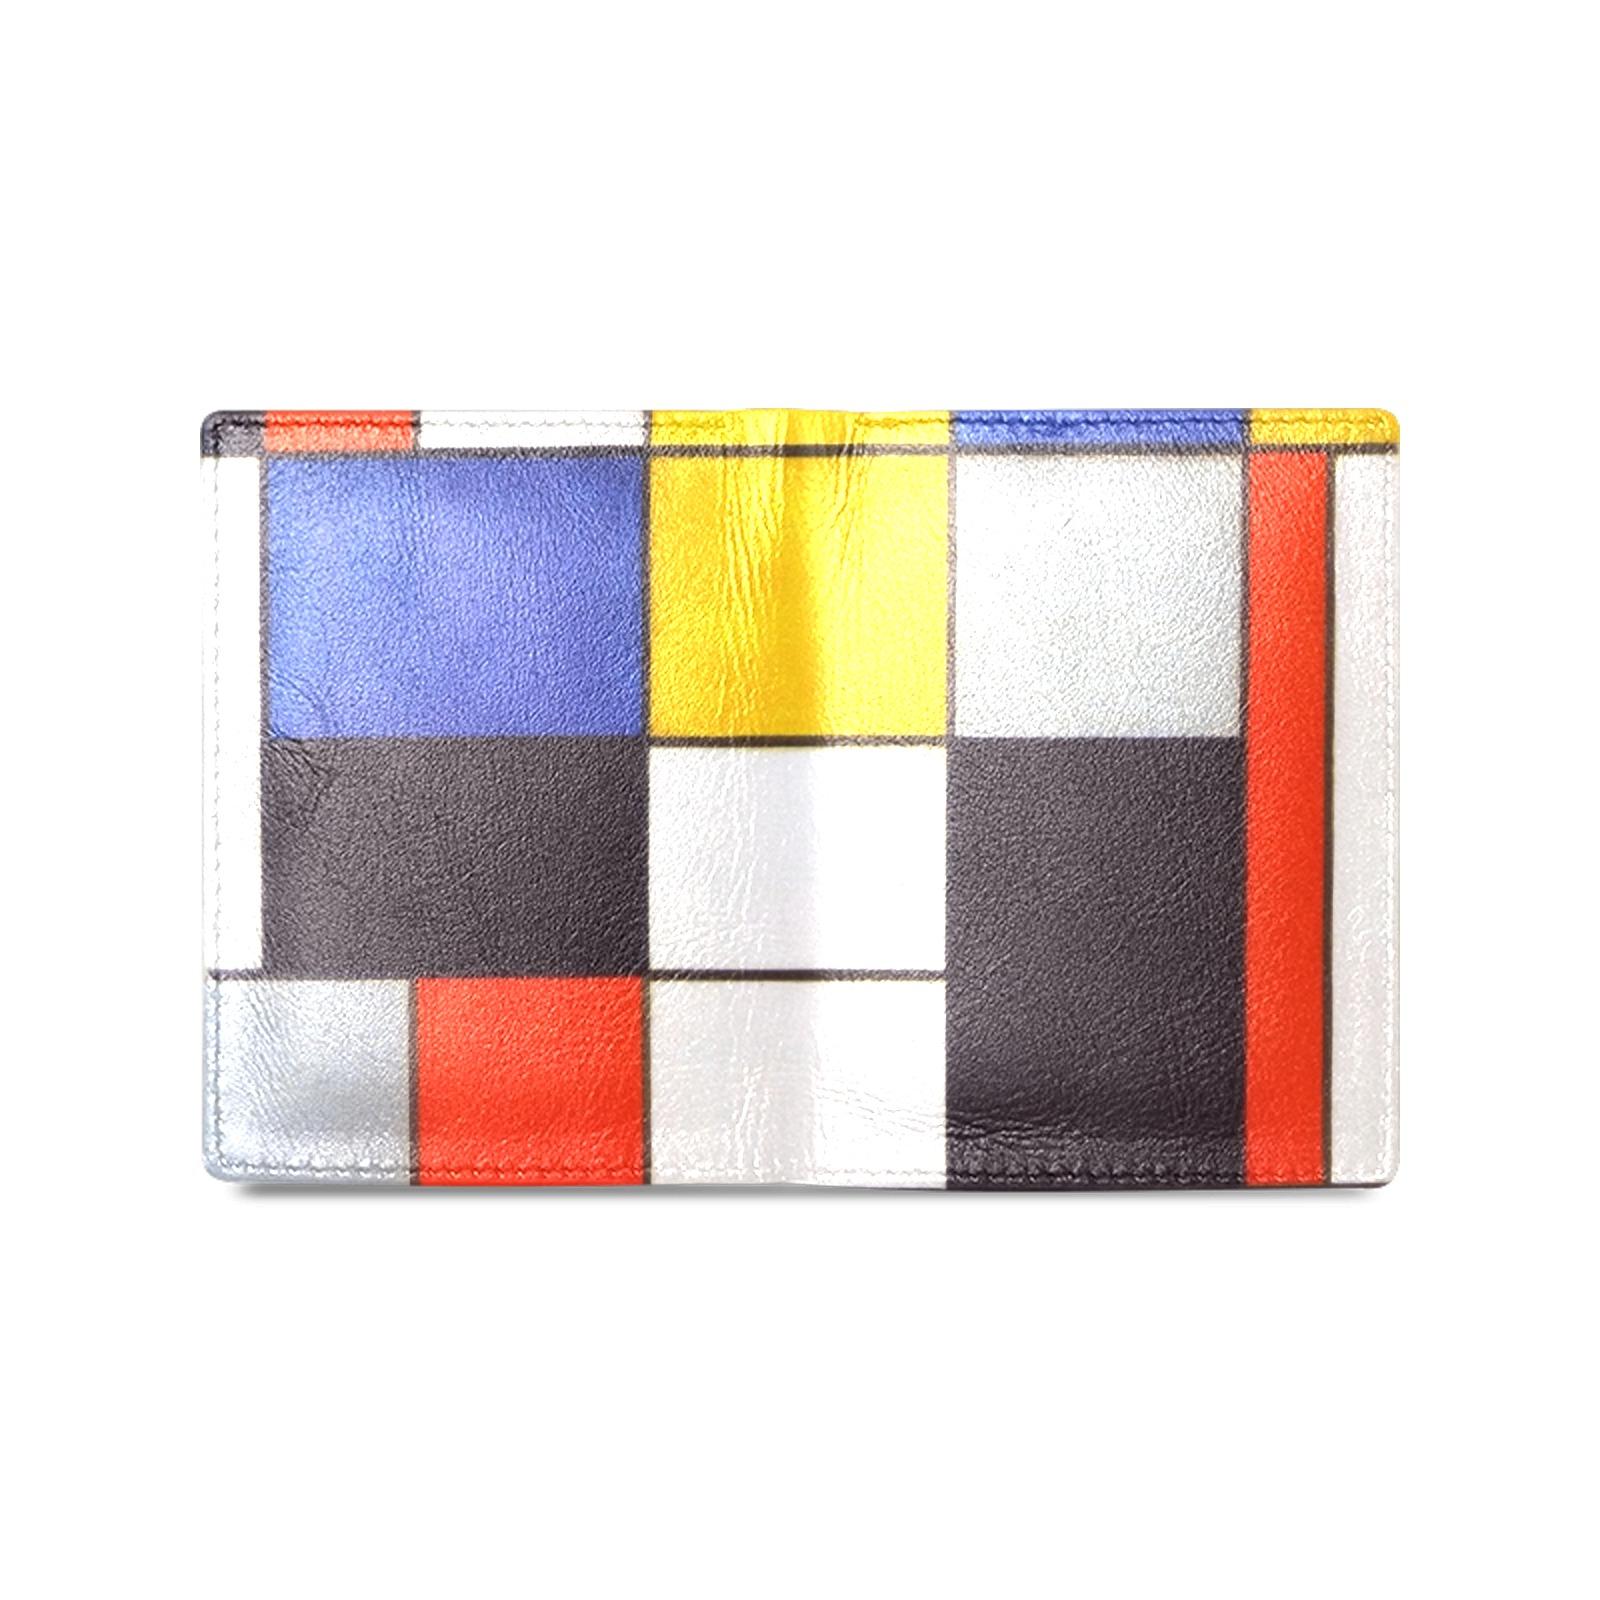 Composition A by Piet Mondrian Men's Leather Wallet (Model 1612)